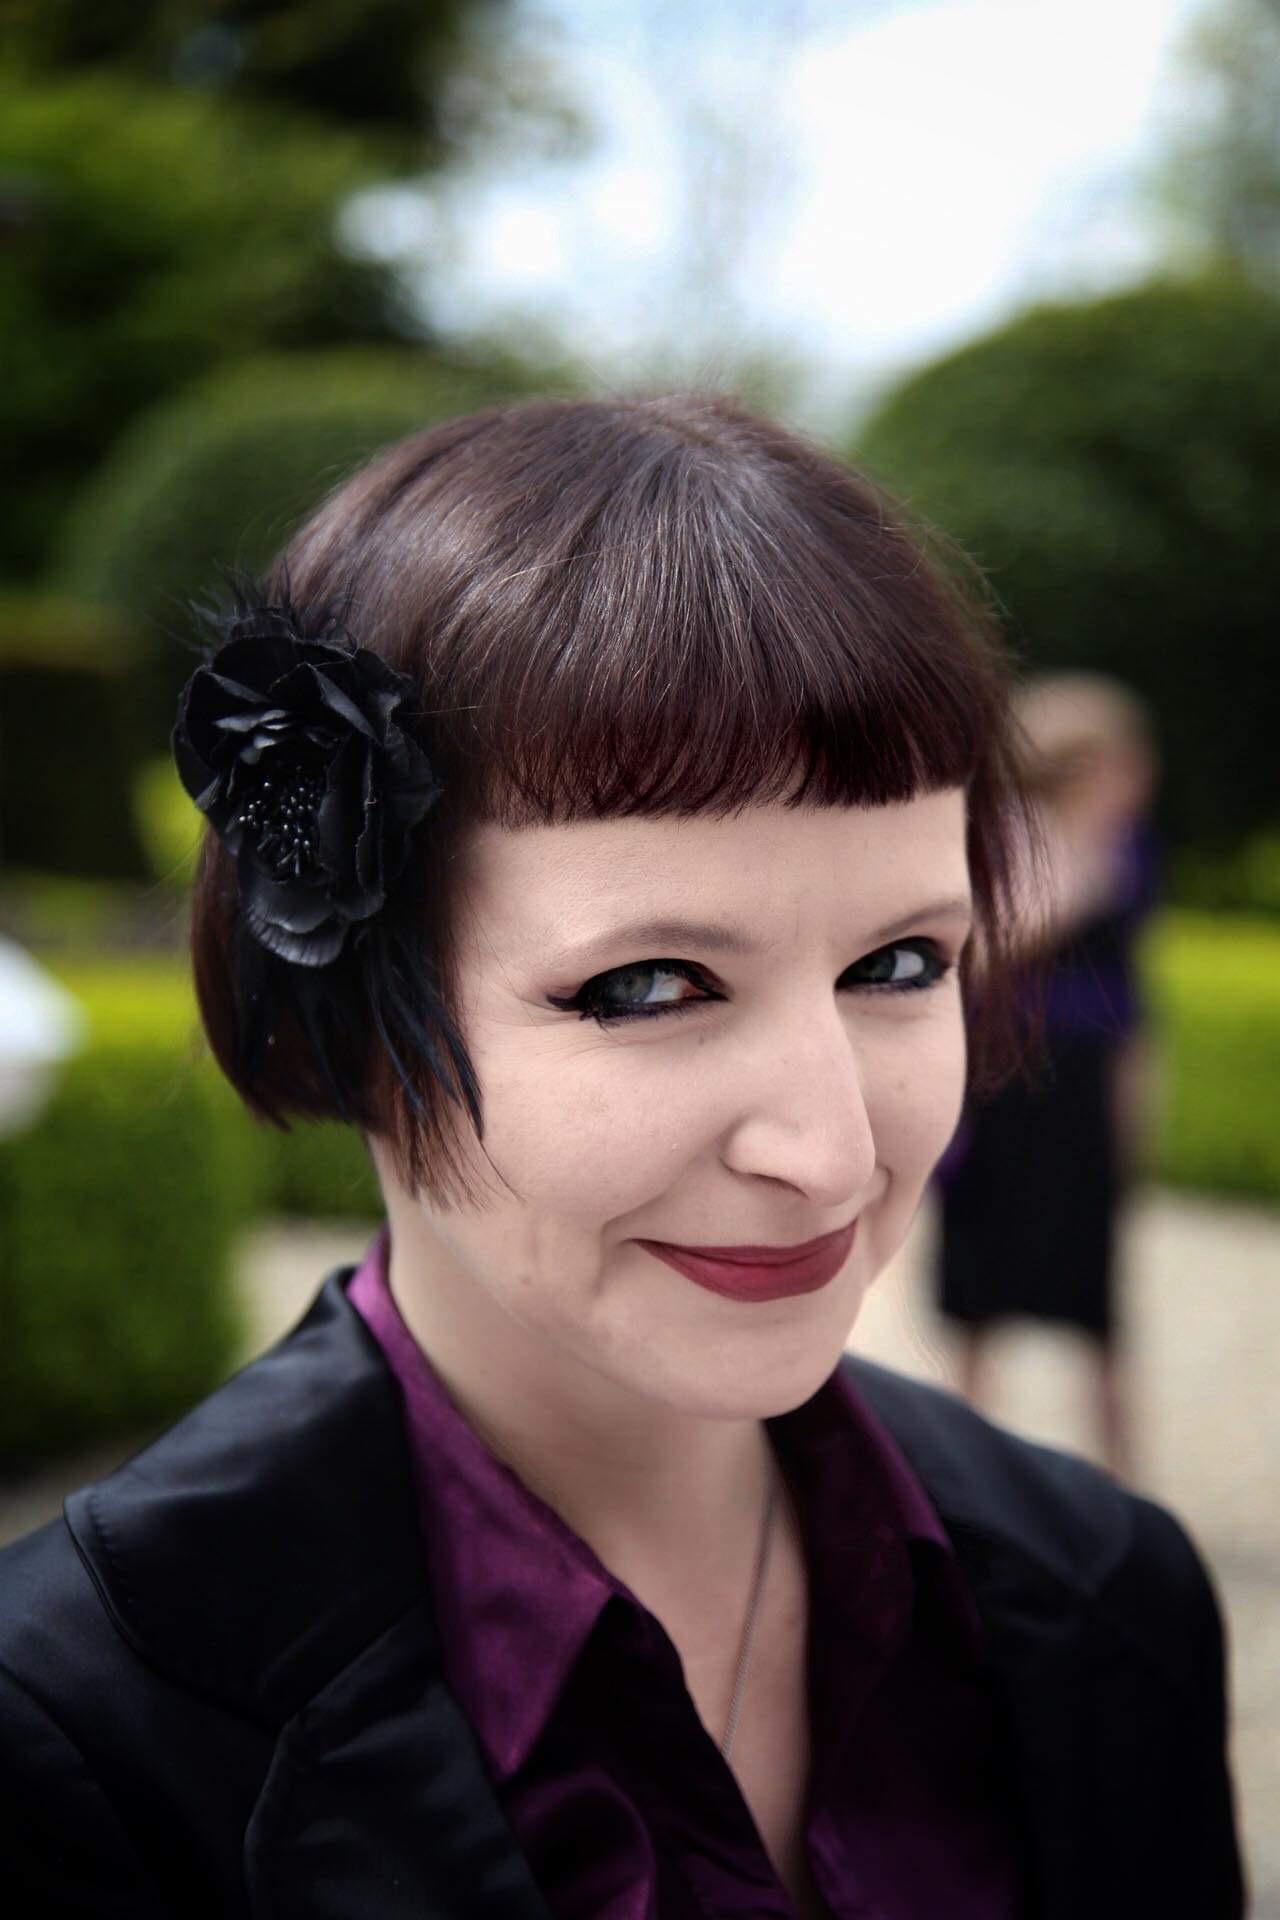 Claire Nally